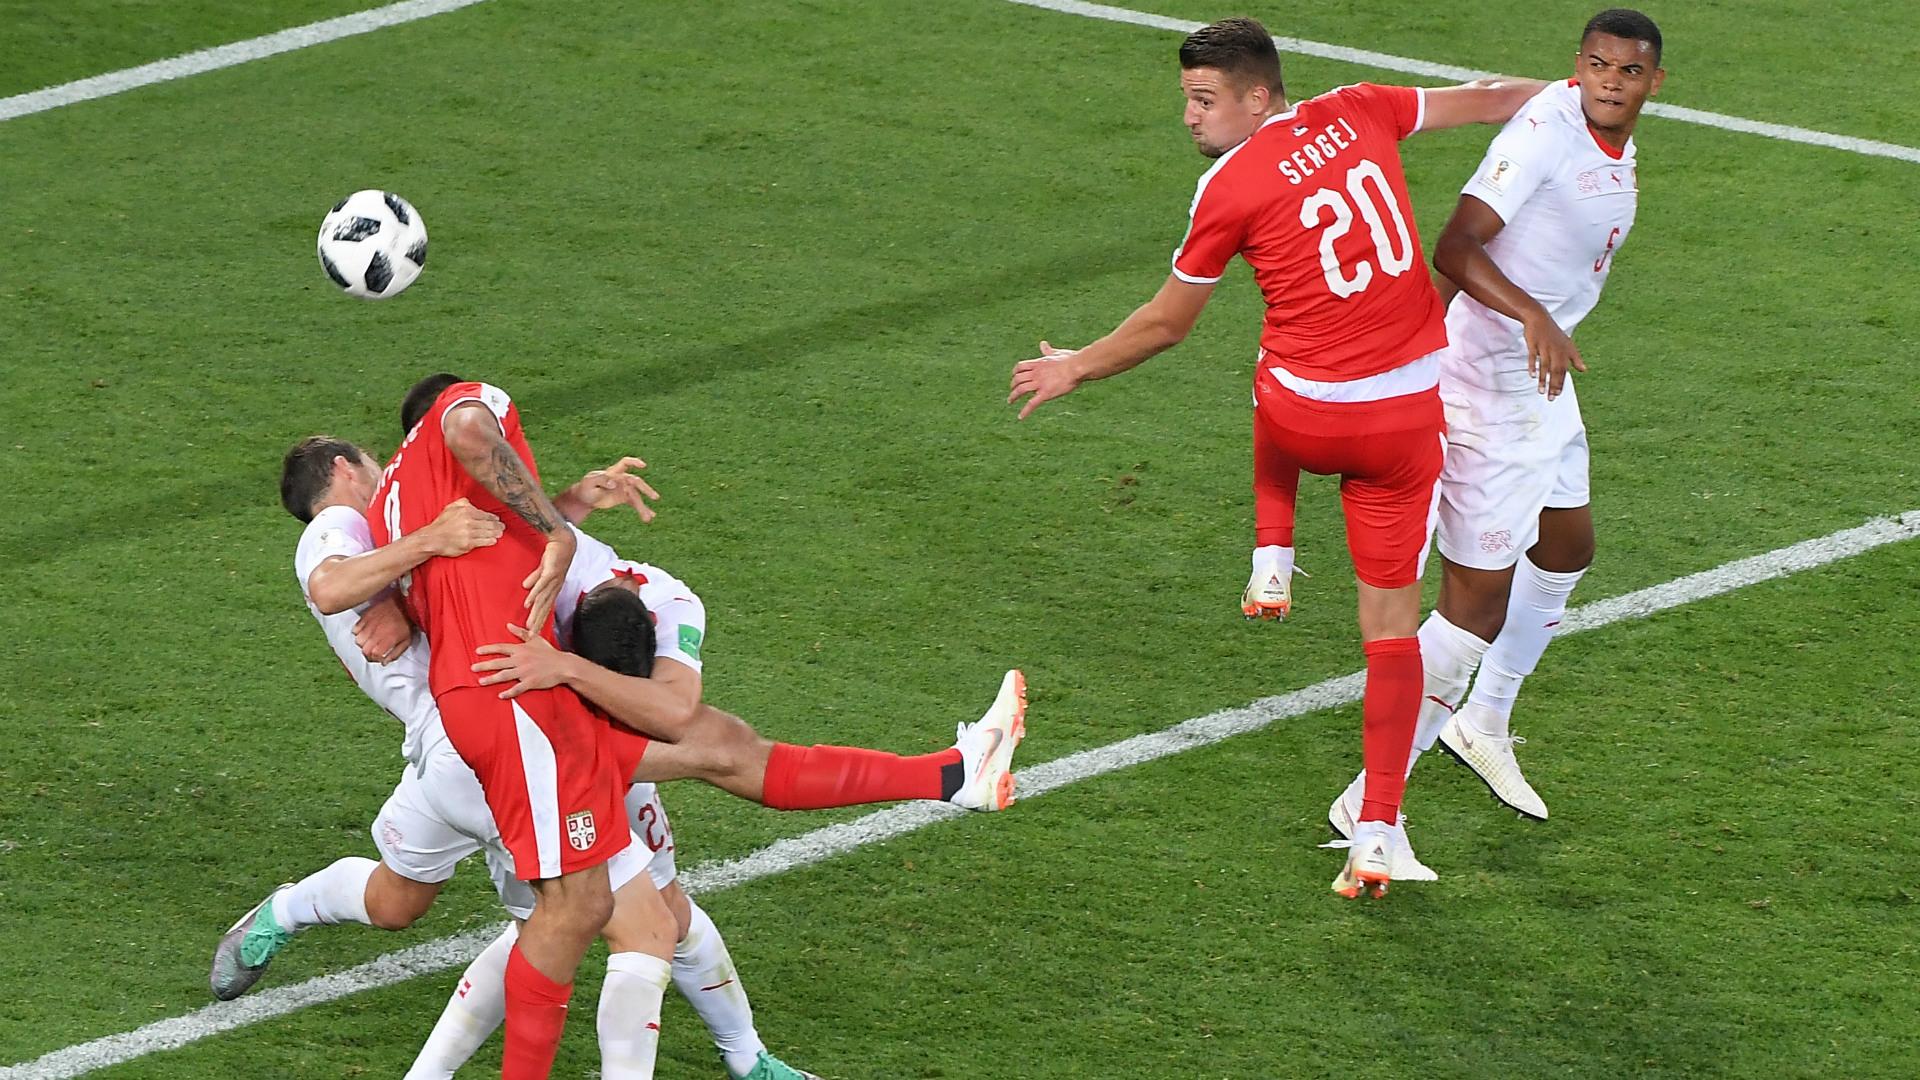 aleksander-mitrovic-serbia-2018-world-cup_1ny0sogbr5yvp1618pwhh7gpcw.jpg